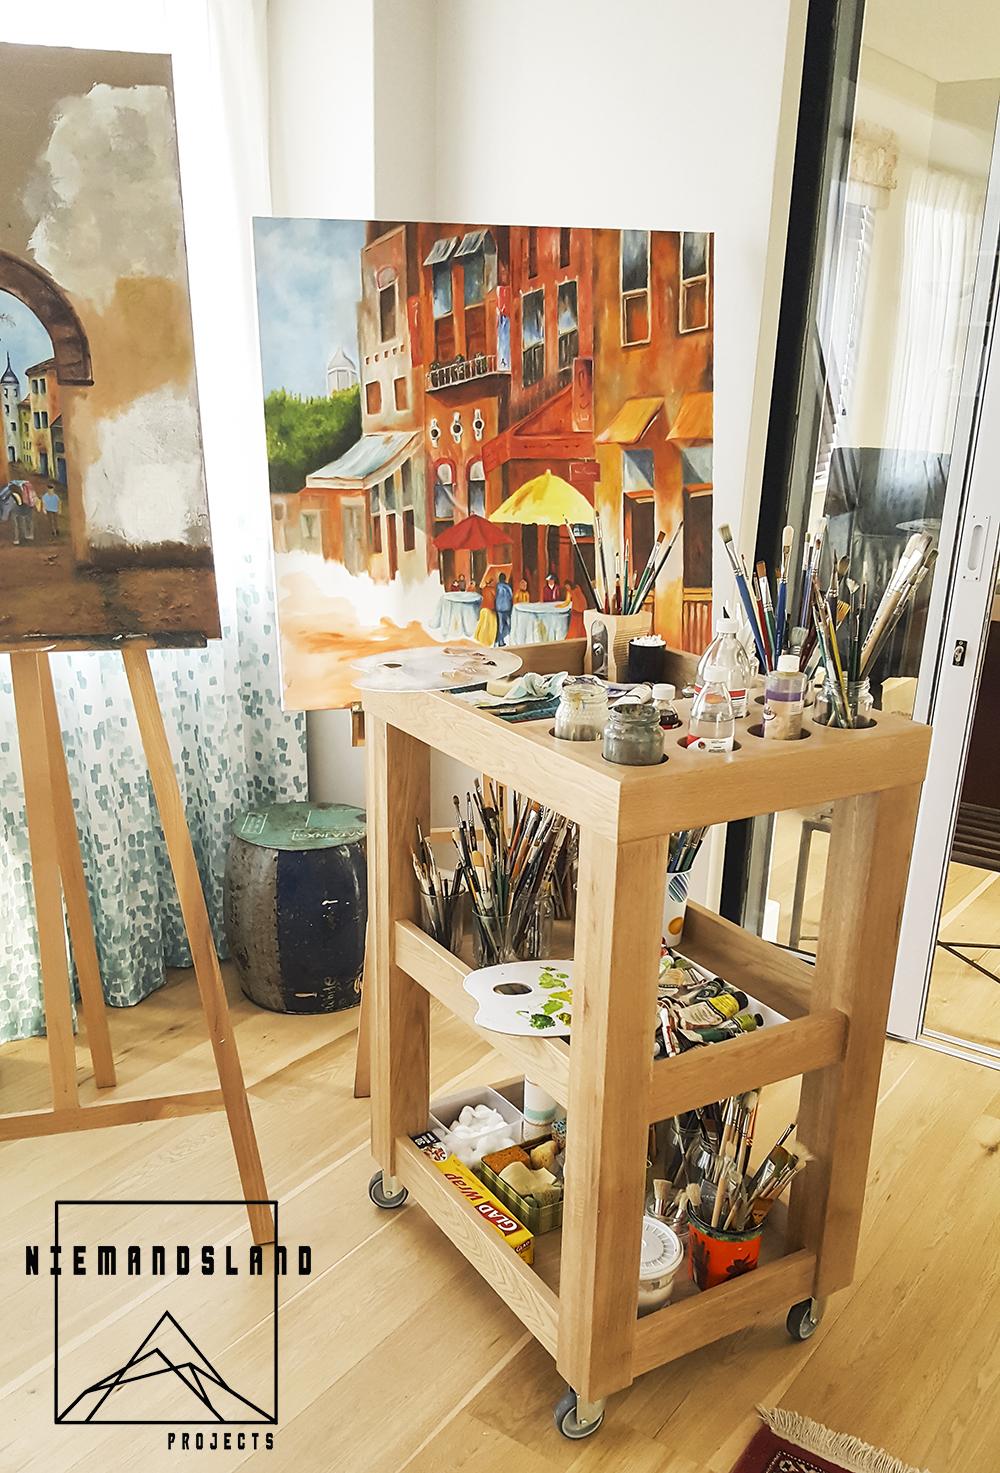 Niemandsland Projects - Cadan cupboards - Furniture